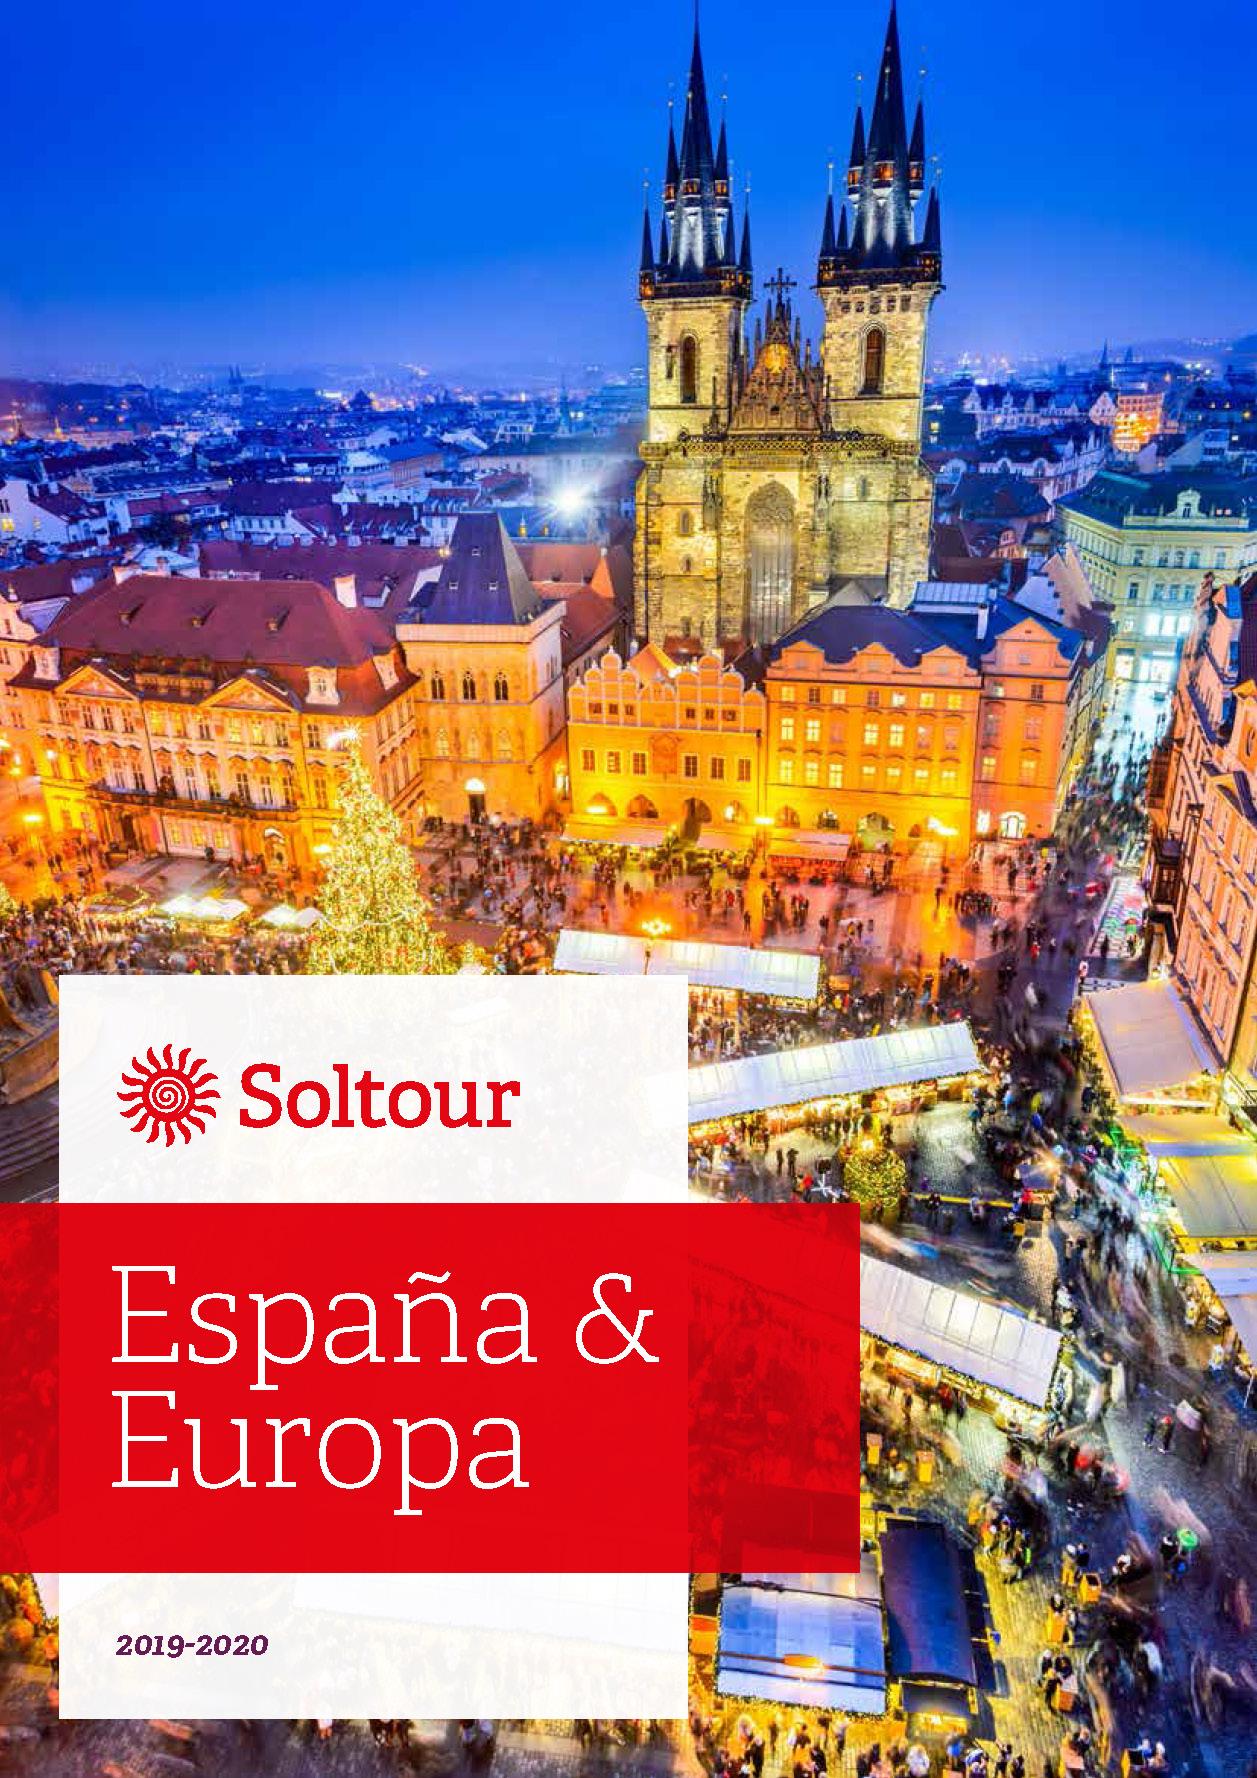 Catalogo Soltour Europa y Espana 2019-2020